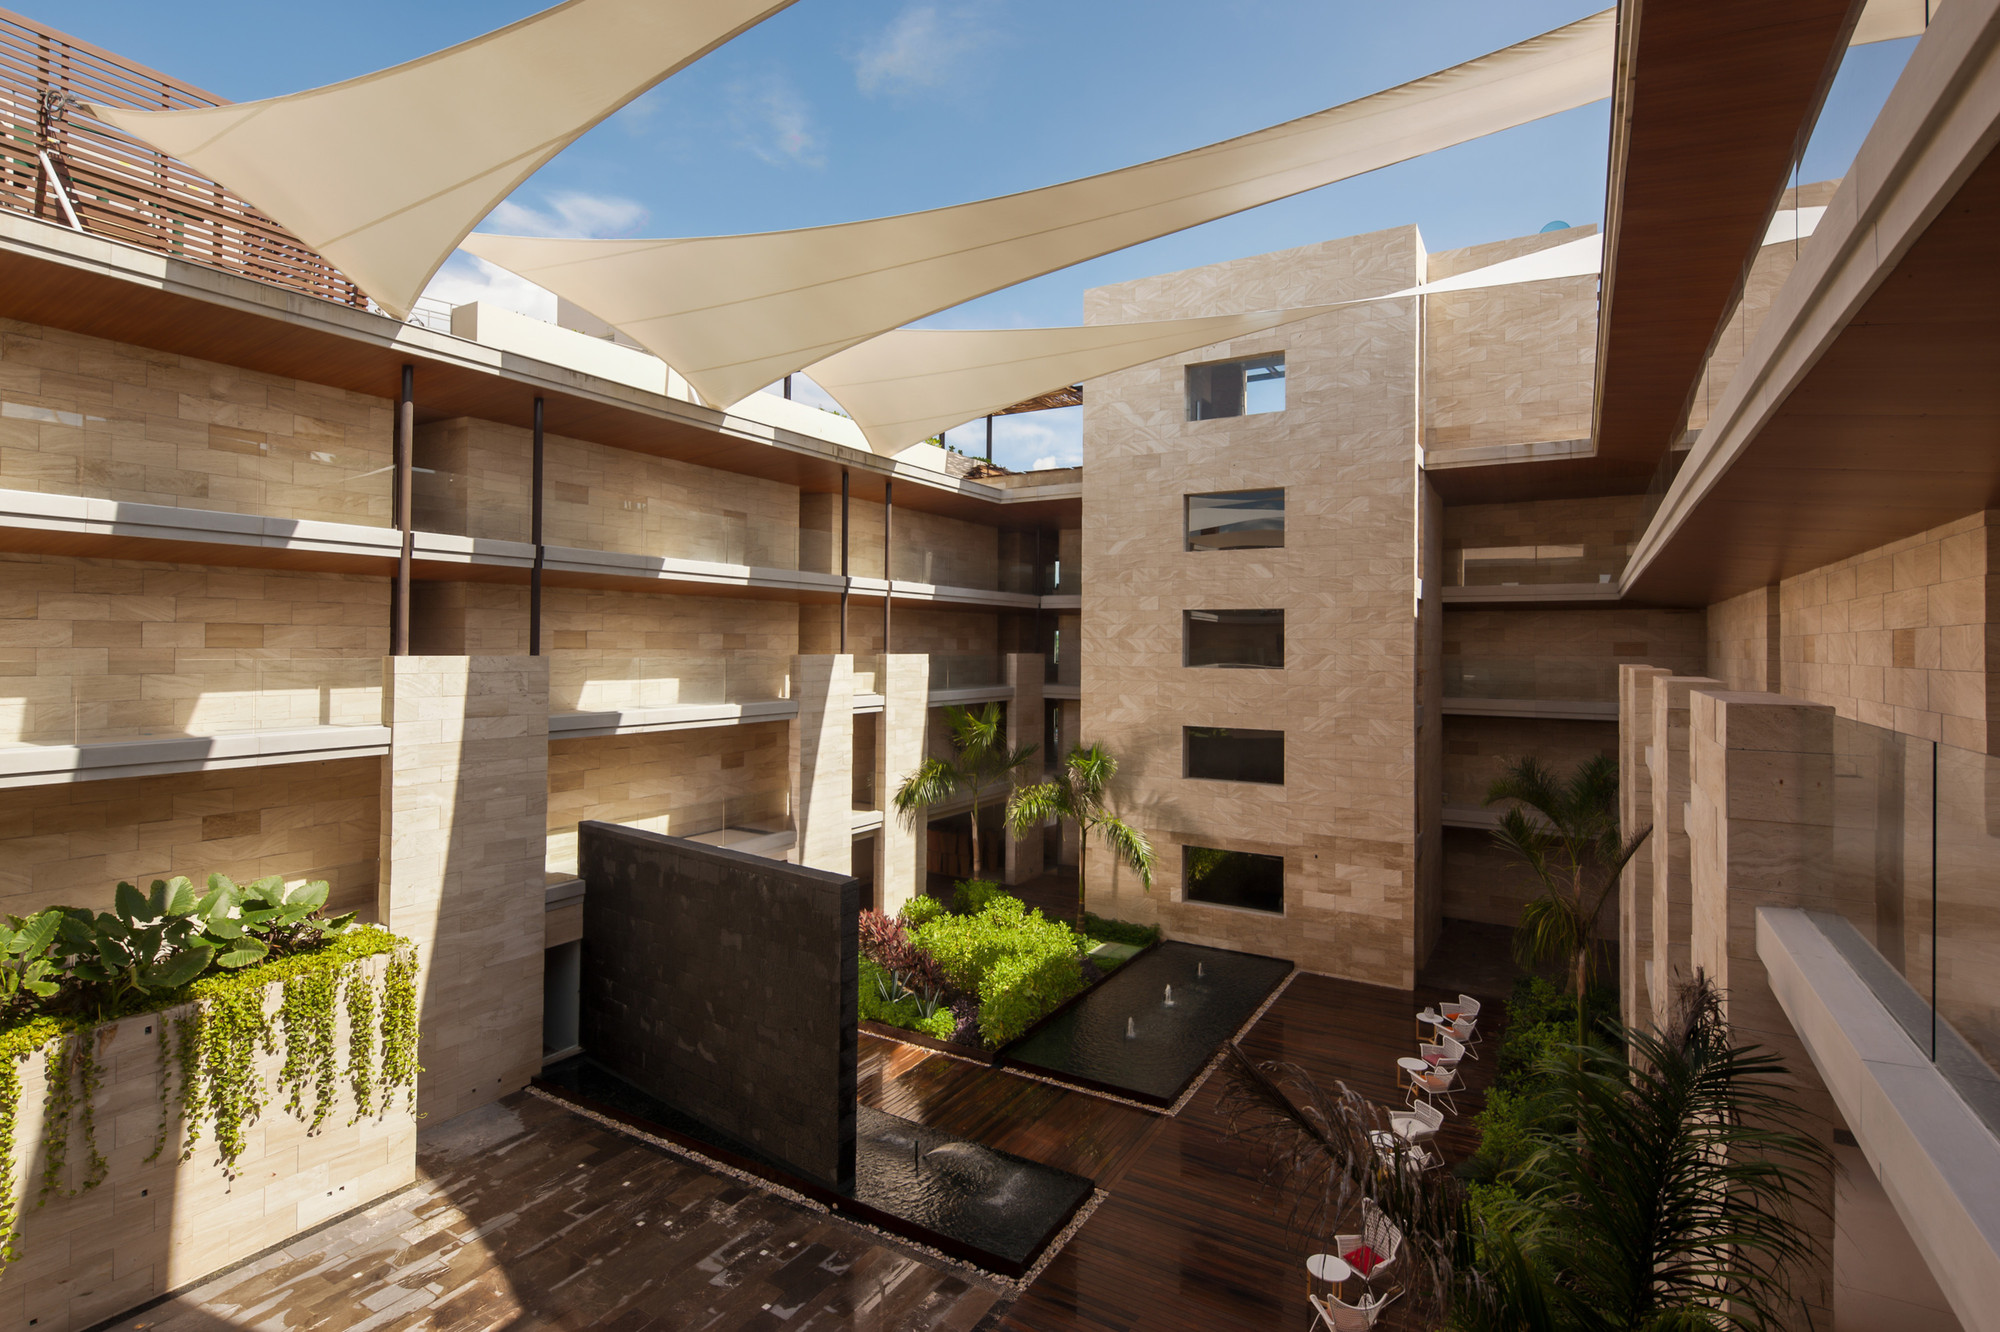 Hotel boutique cacao rdlp arquitectos archdaily m xico for Arquitectura de hoteles